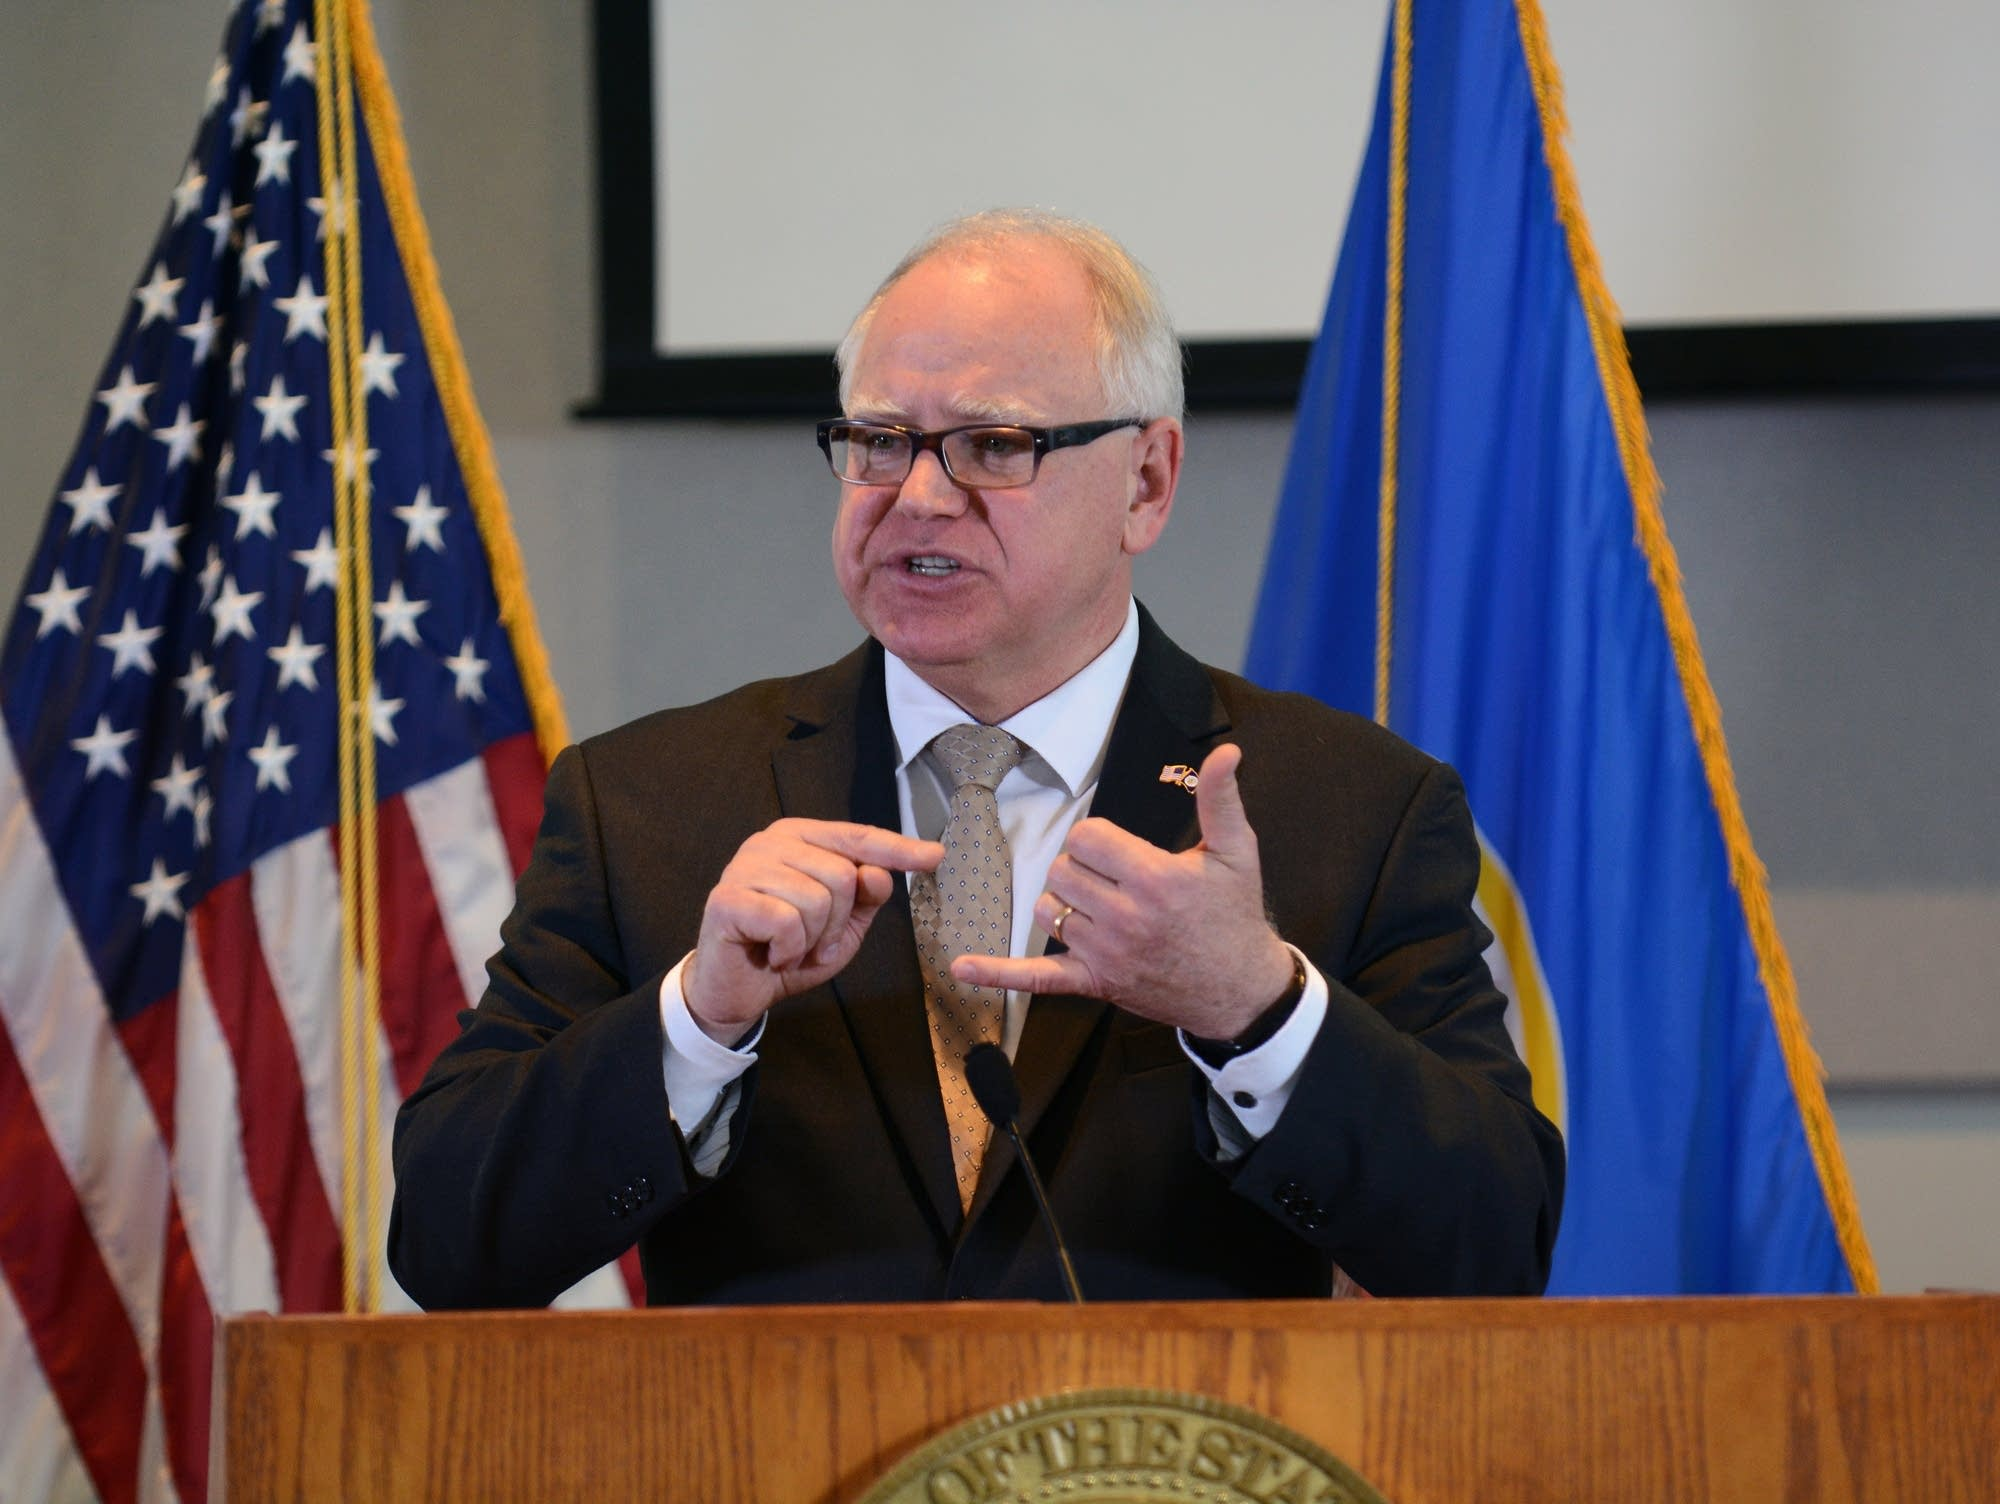 Gov. Tim Walz presented first state budget